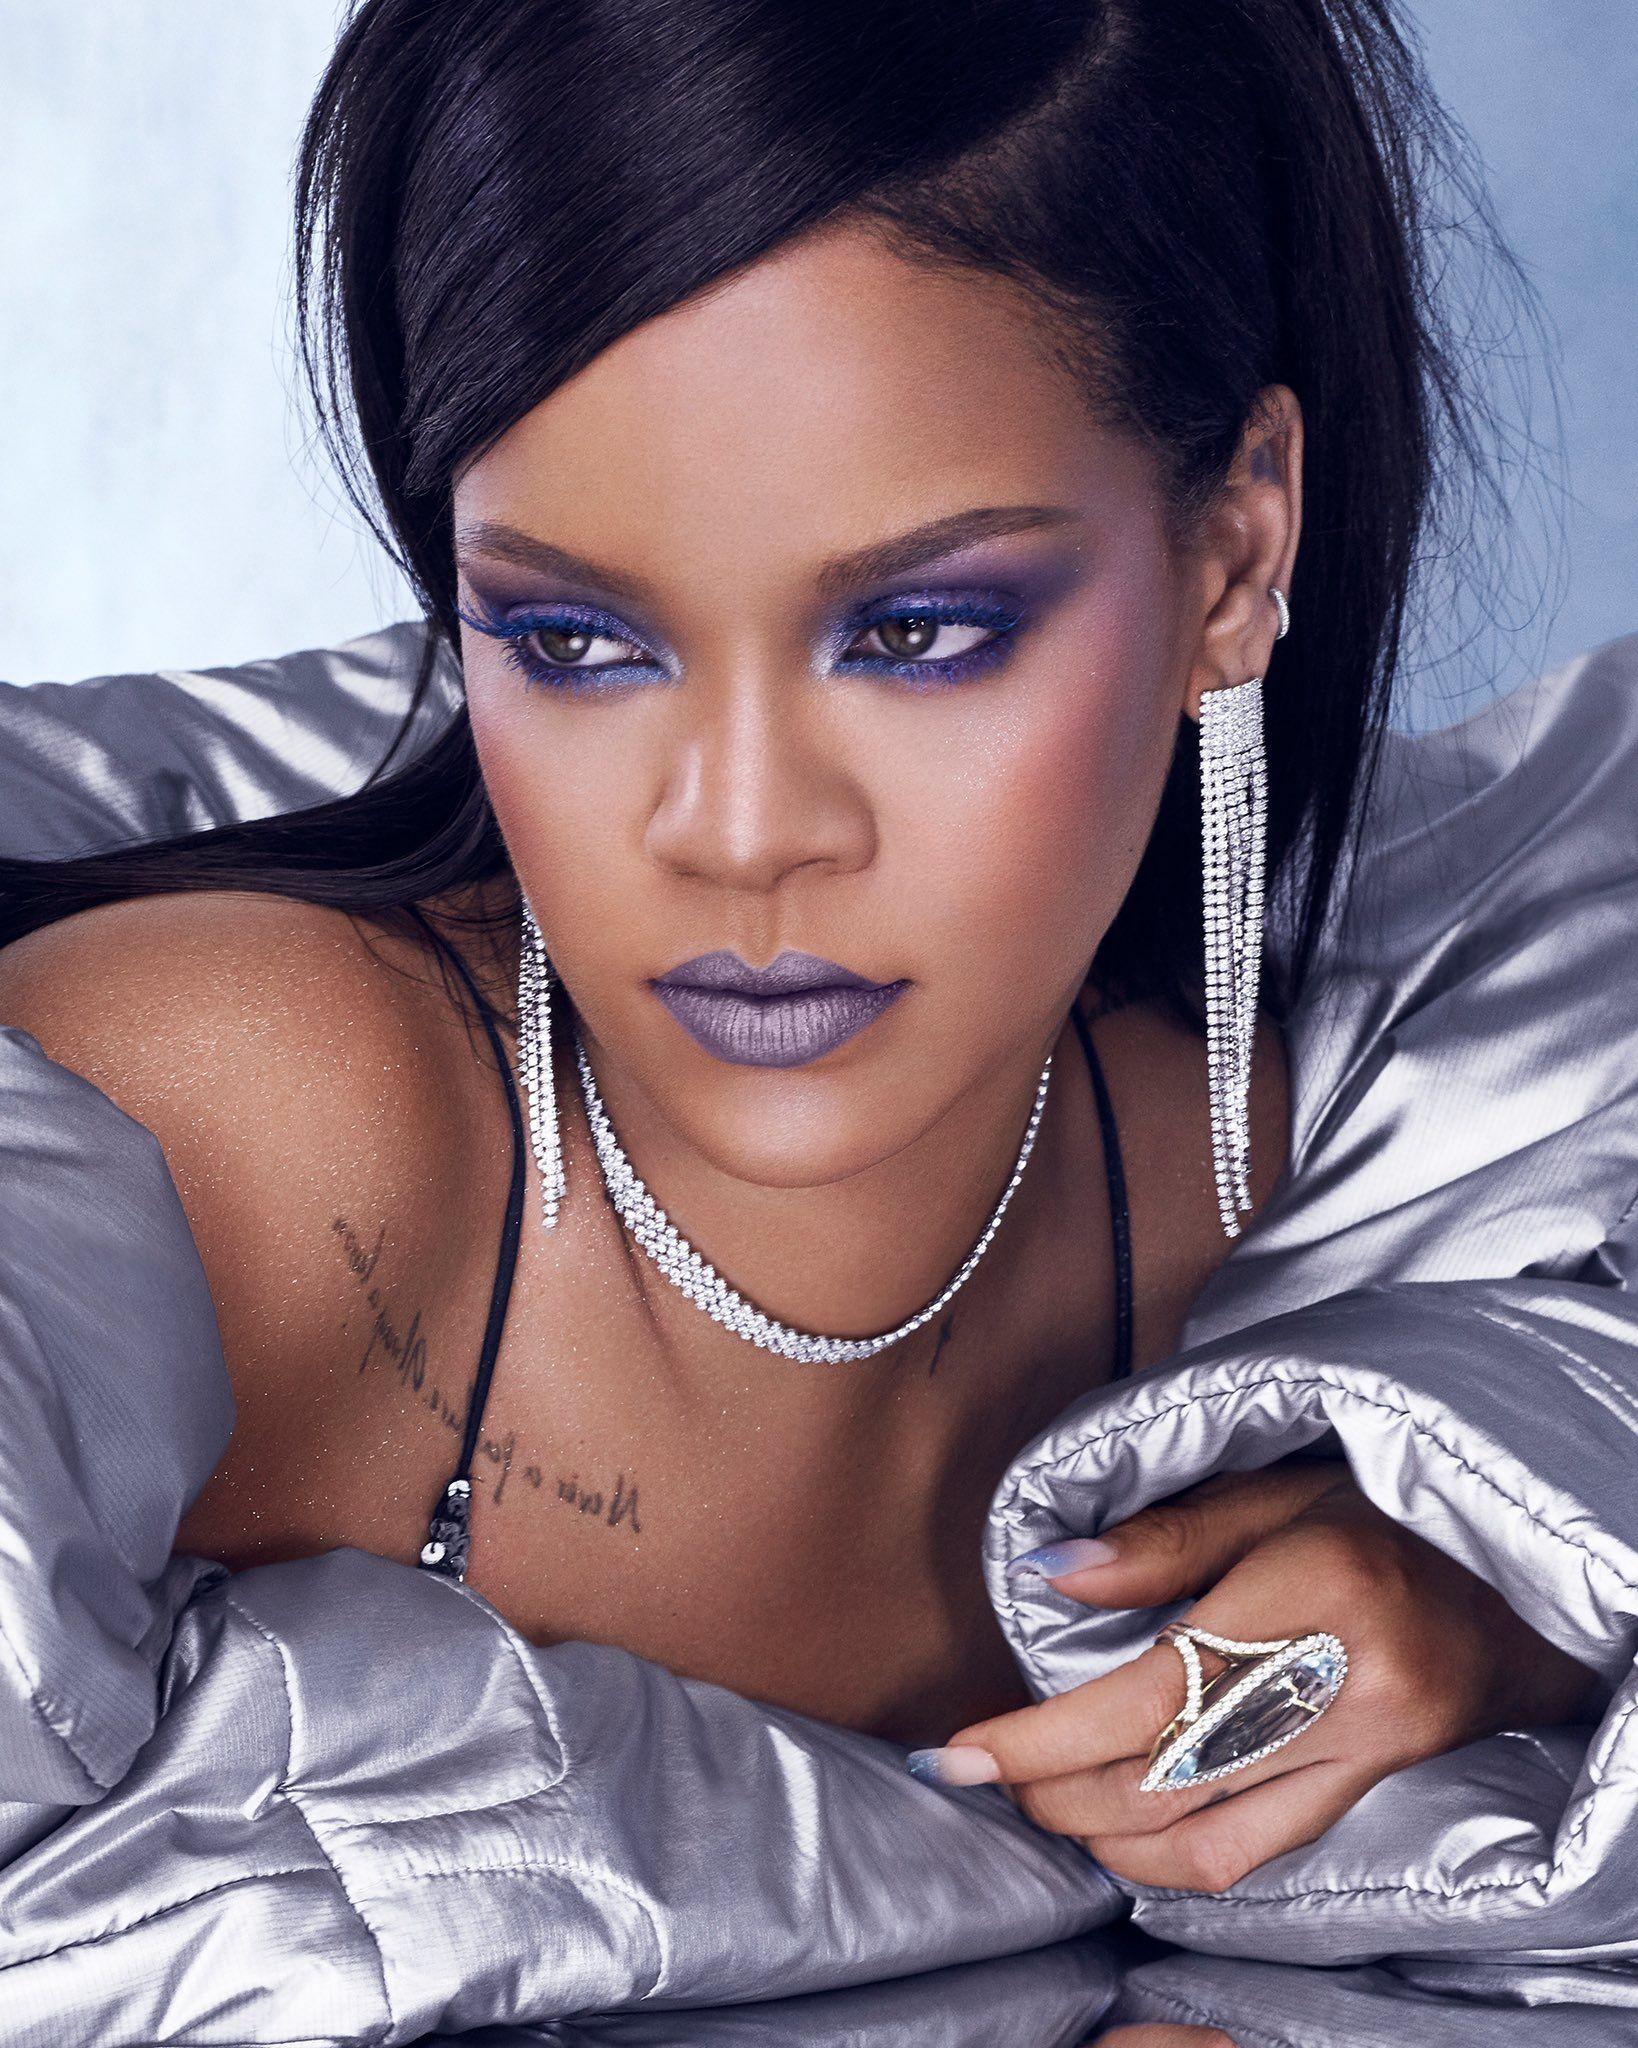 Pin by Azy Christie on Wowzah⚡️ Fenty beauty, Rihanna